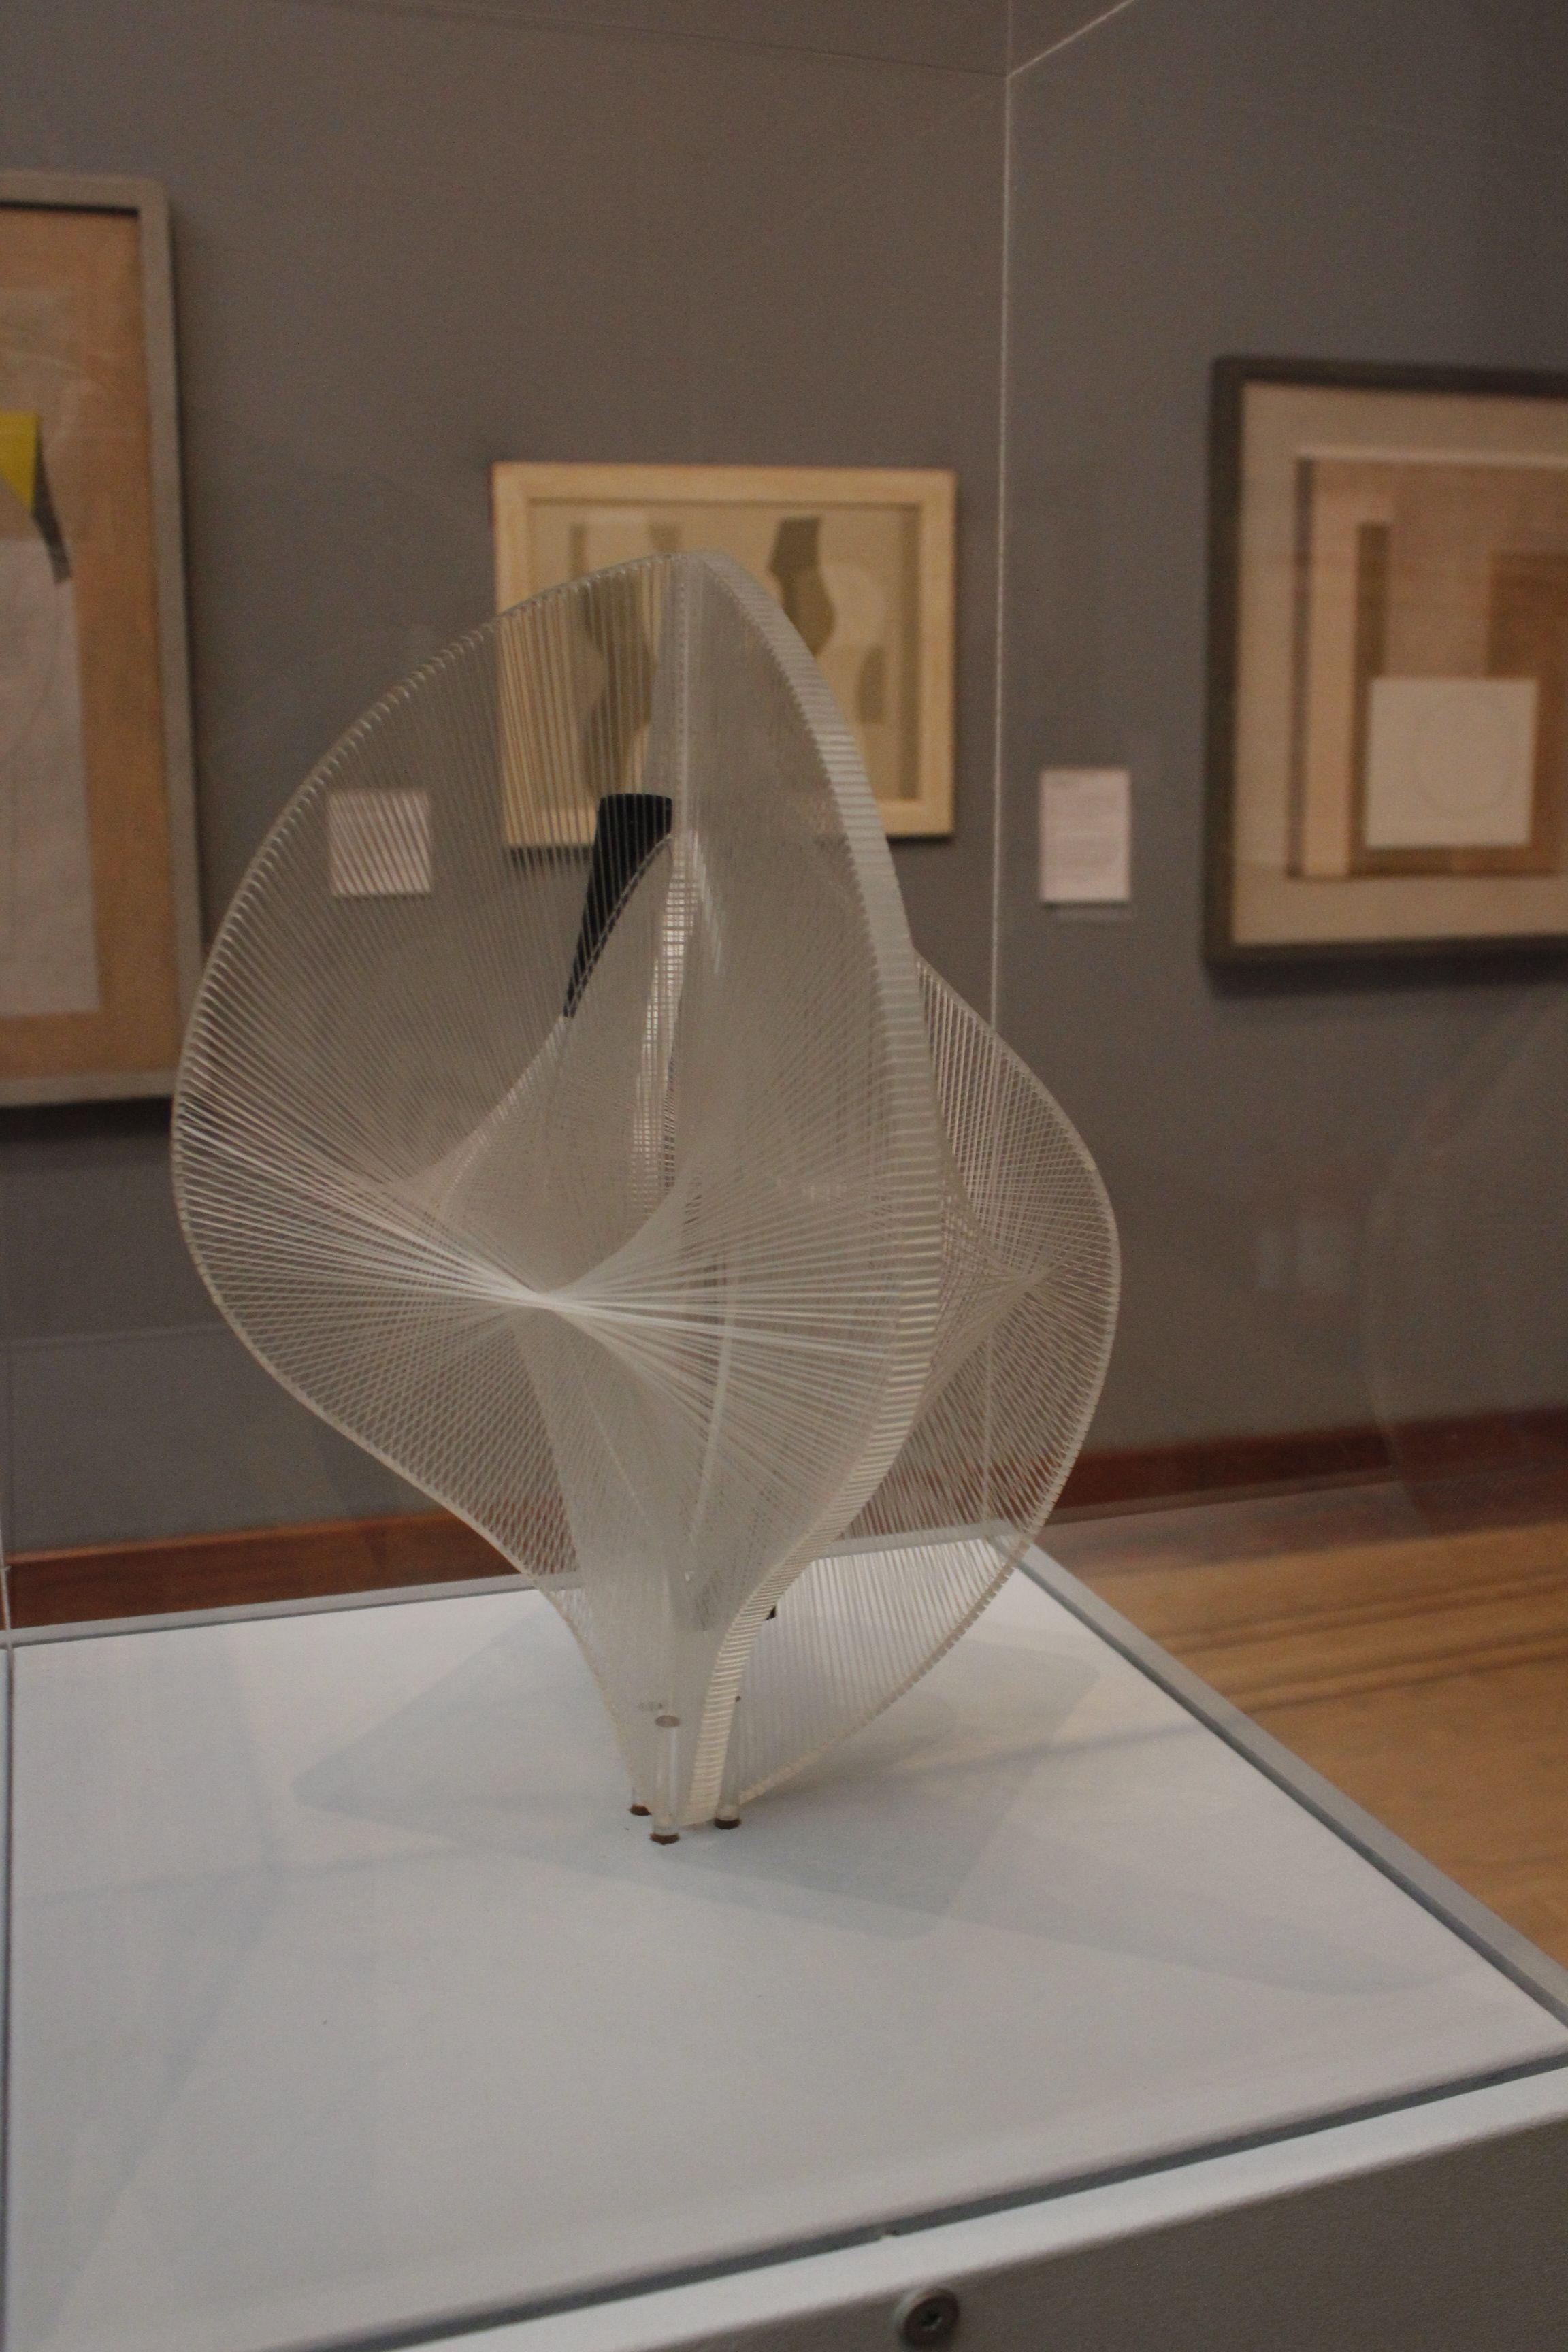 Pin By Muge Bayraktar On 20th Century Birmigham Art Gallery And Museum Birmingham Art Gallery Modern Sculpture Kinetic Sculpture